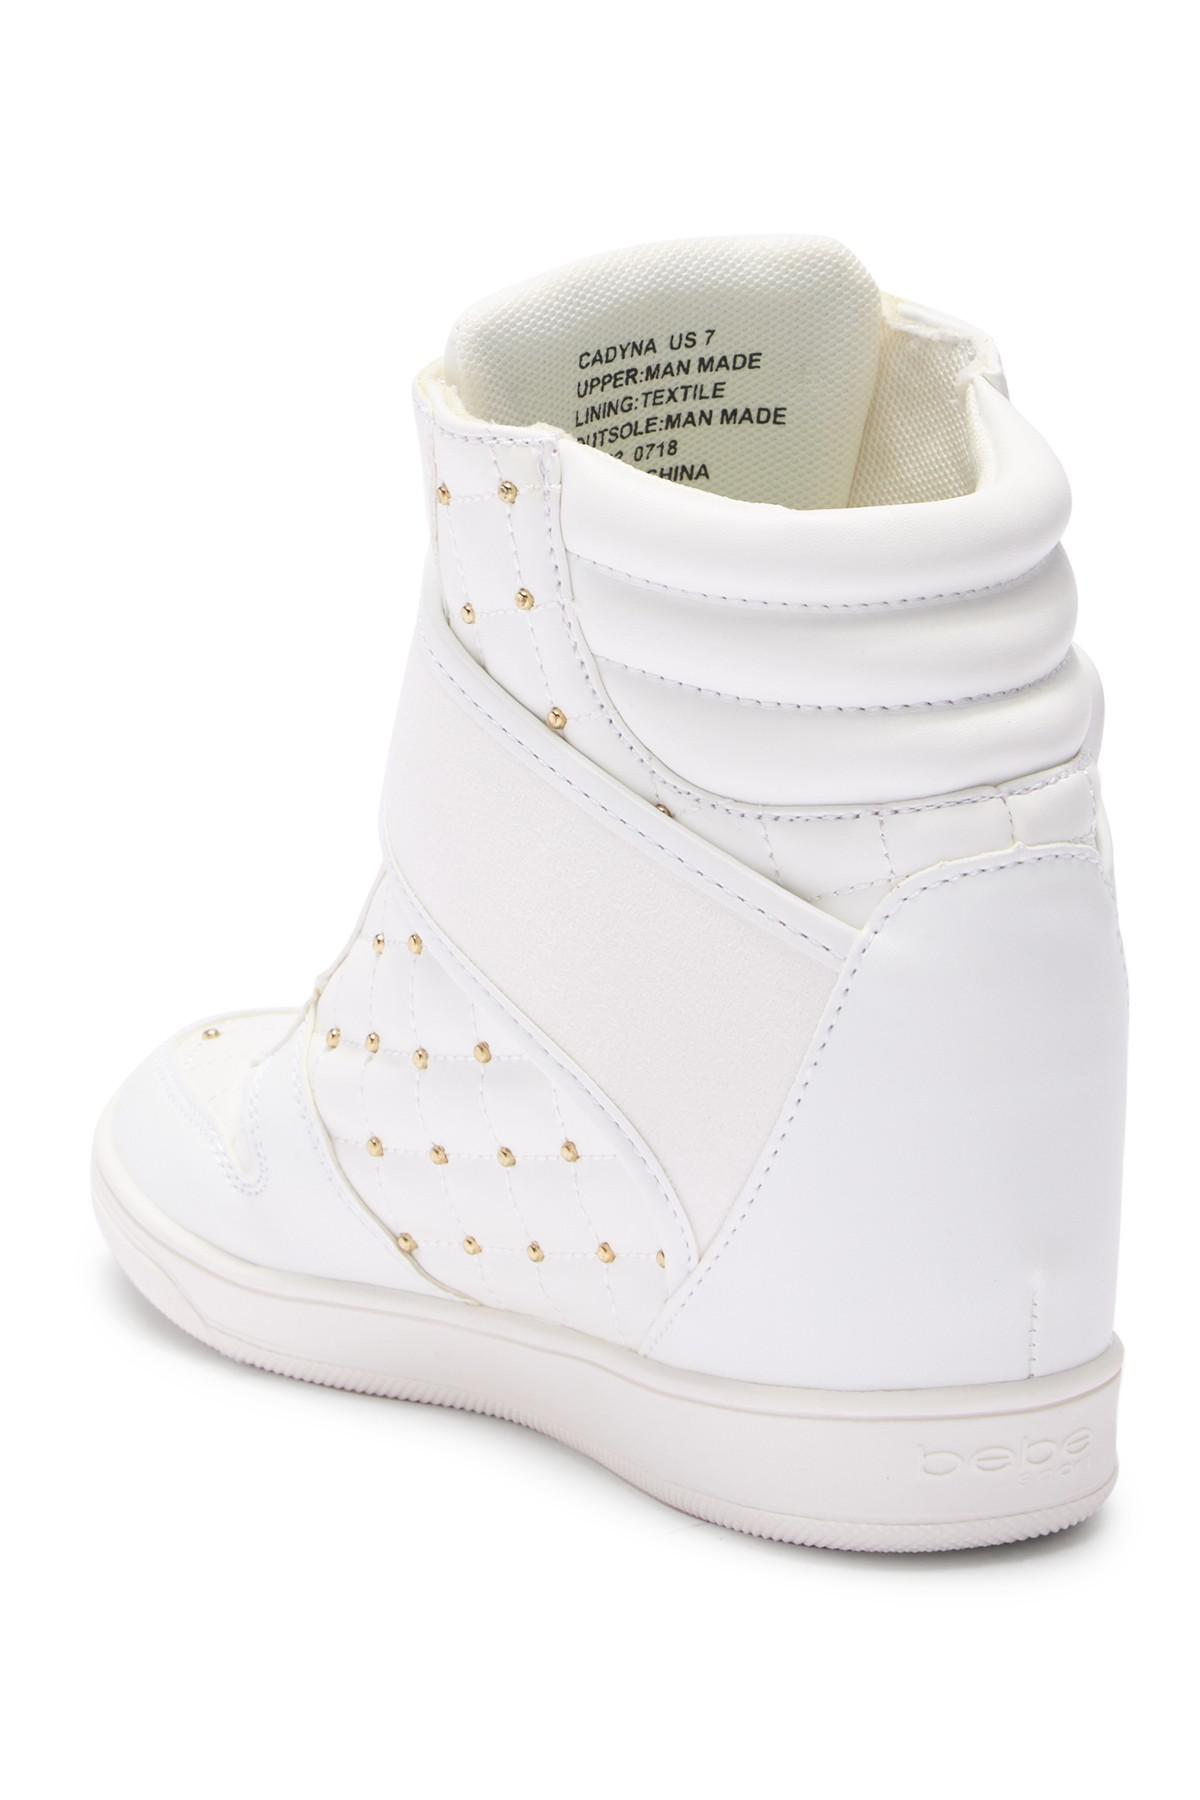 3bc08b536bd7 Lyst - Bebe Studded Hi-top Wedge Sneaker in White